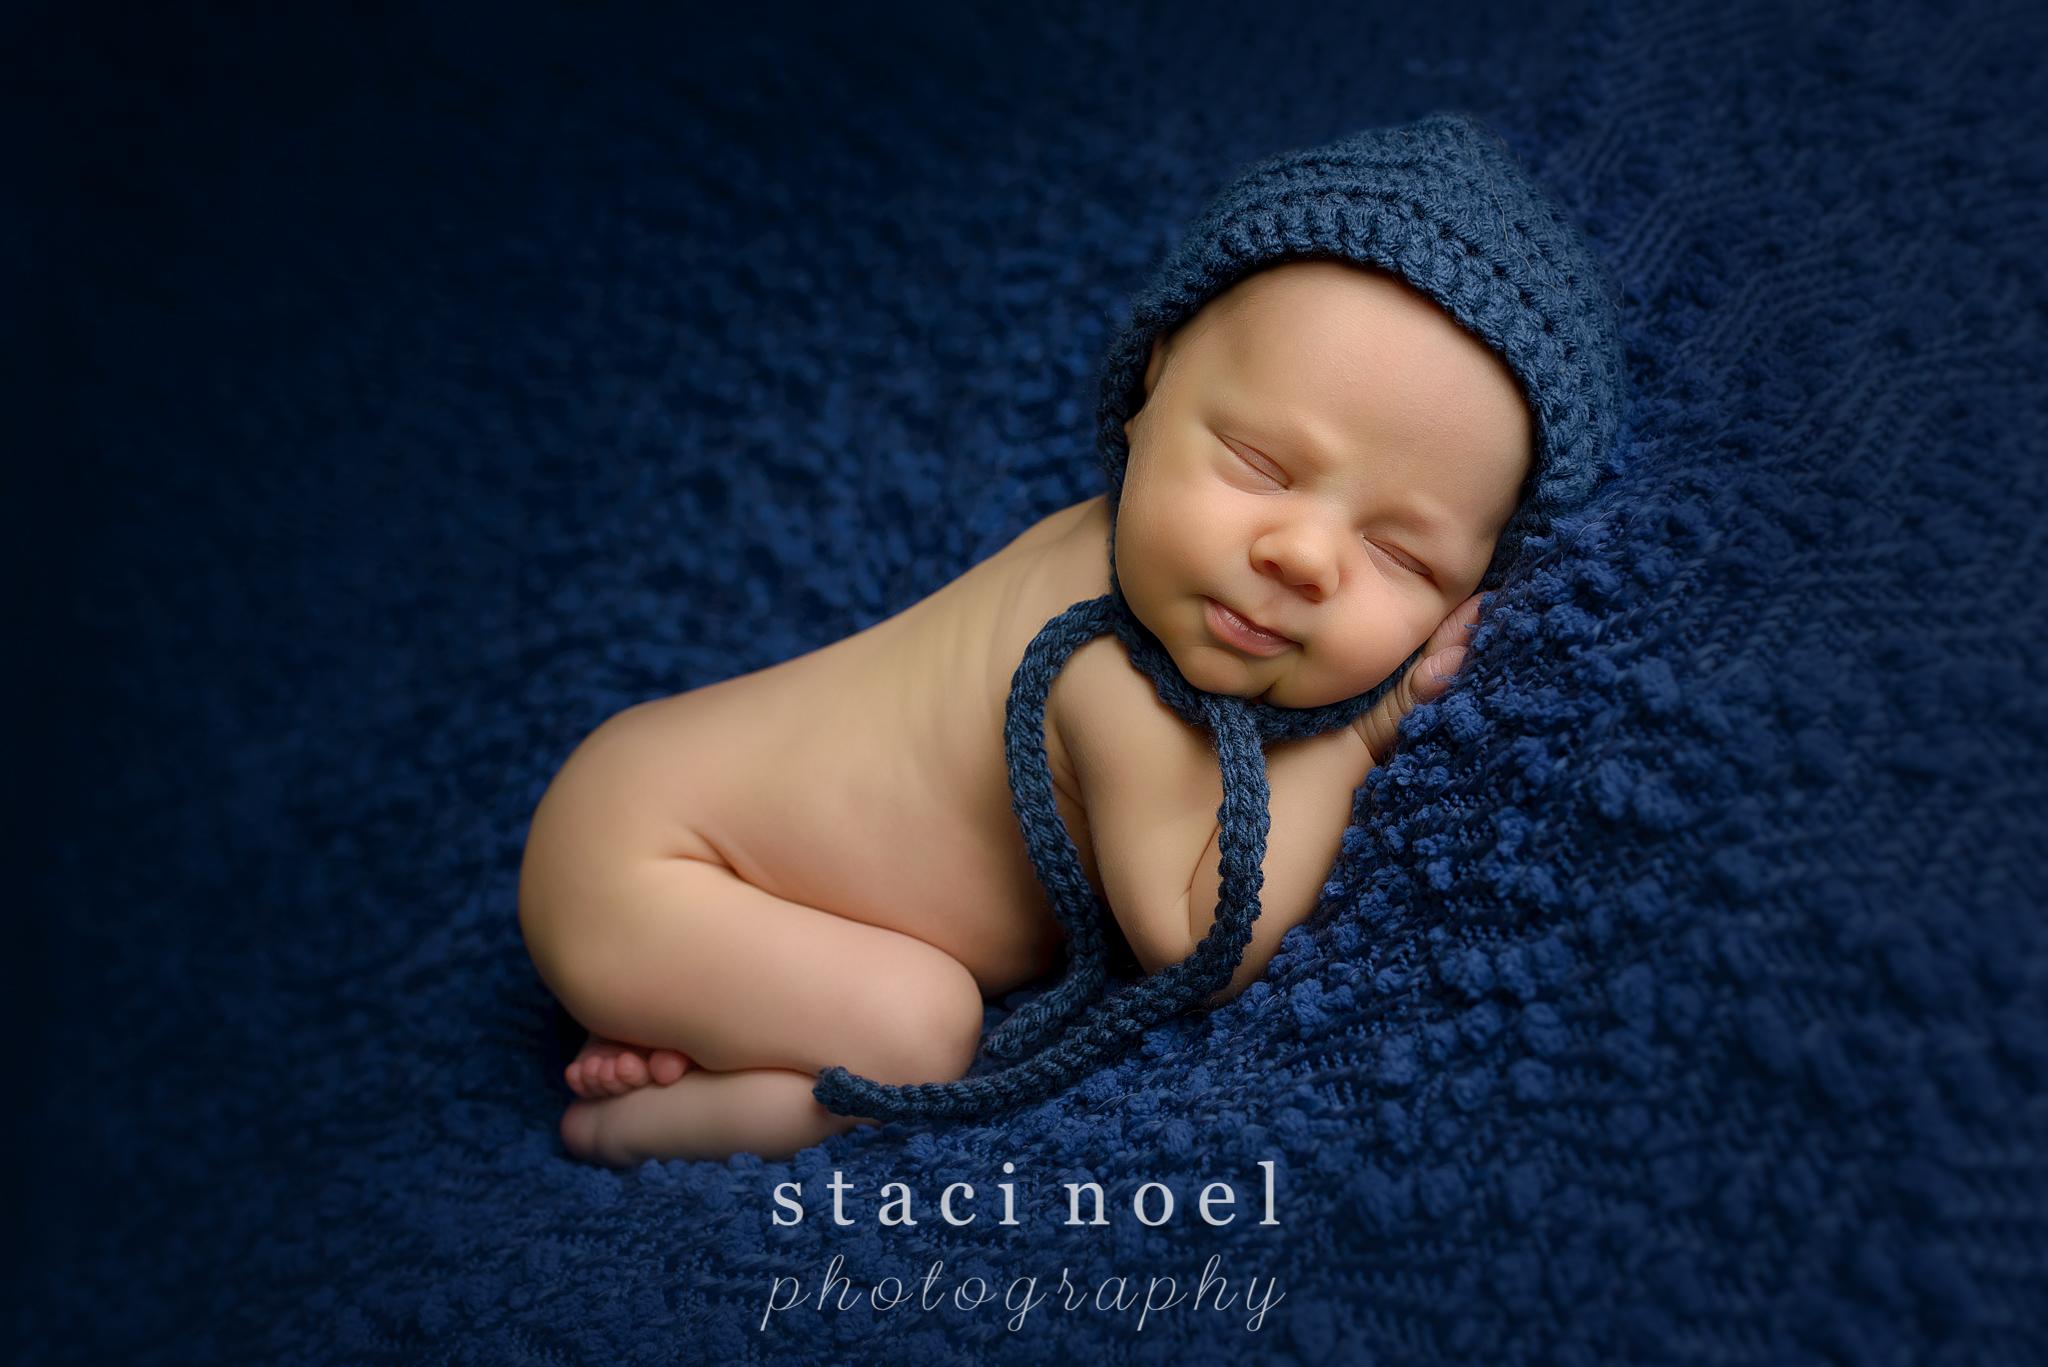 staci.noel.photography.newborn.boy.charlotte.nc10.jpg